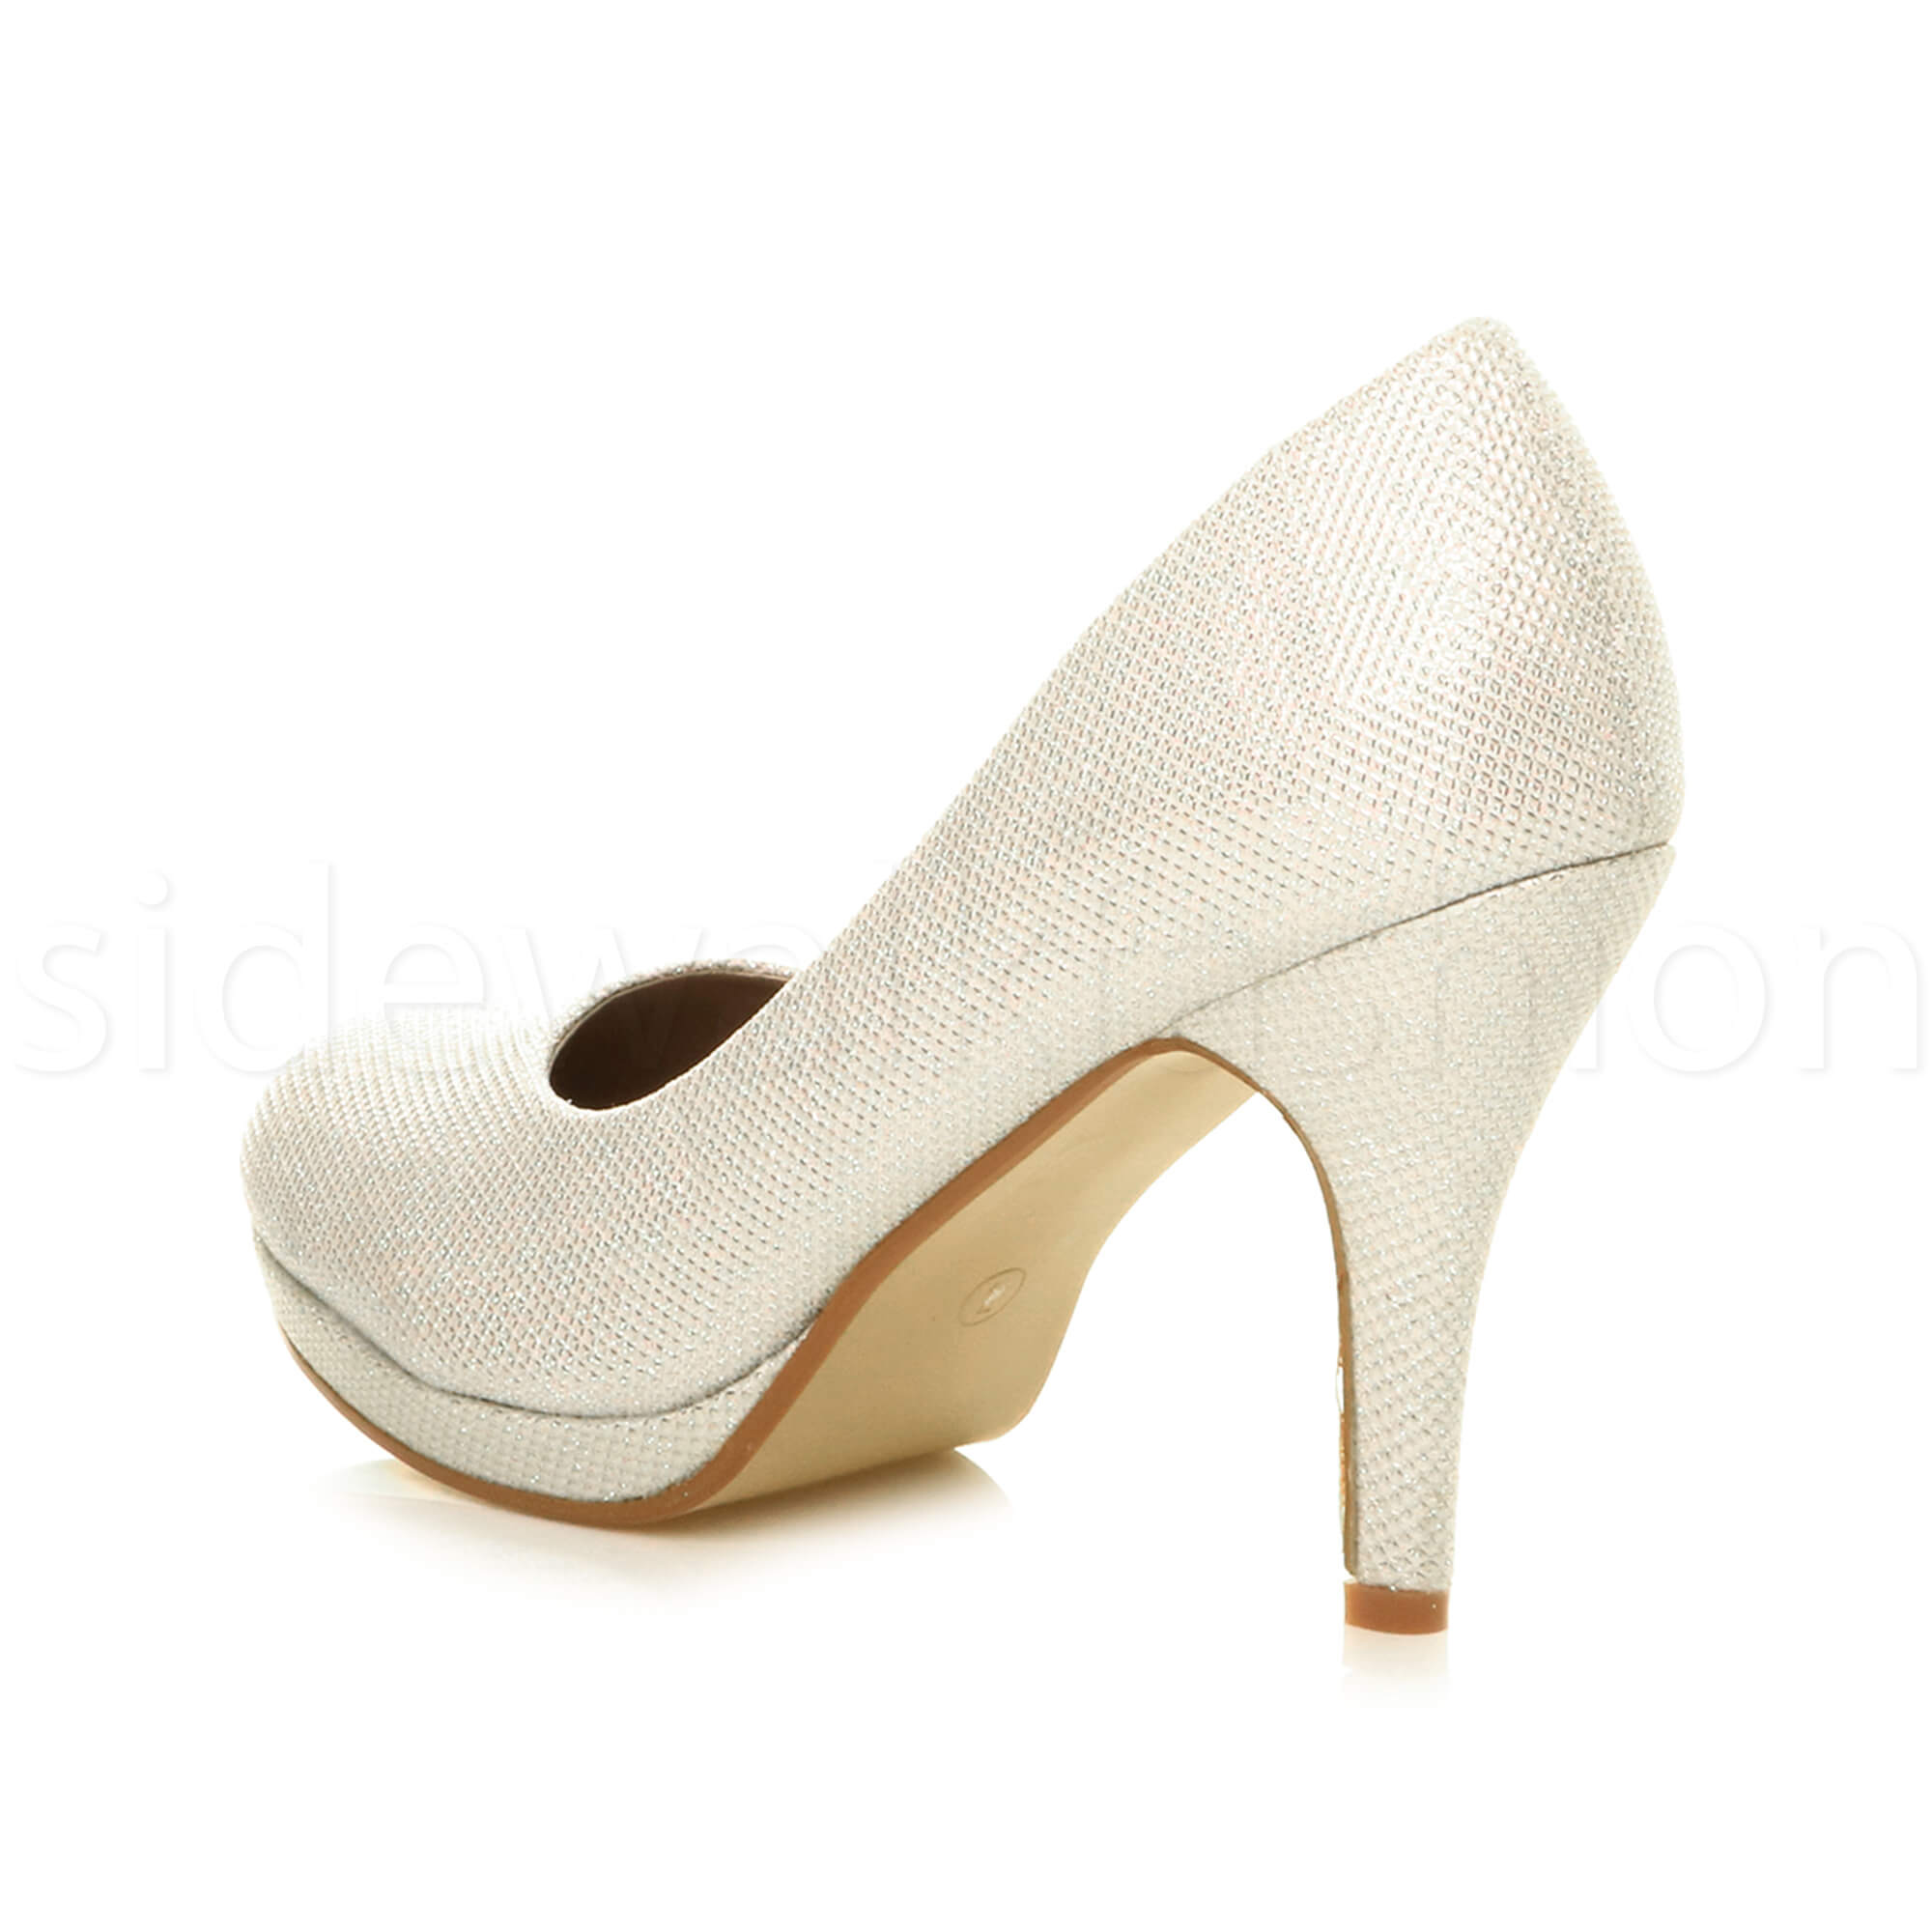 Womens-ladies-high-mid-heel-platform-wedding-evening-bridesmaid-court-shoes-size thumbnail 82